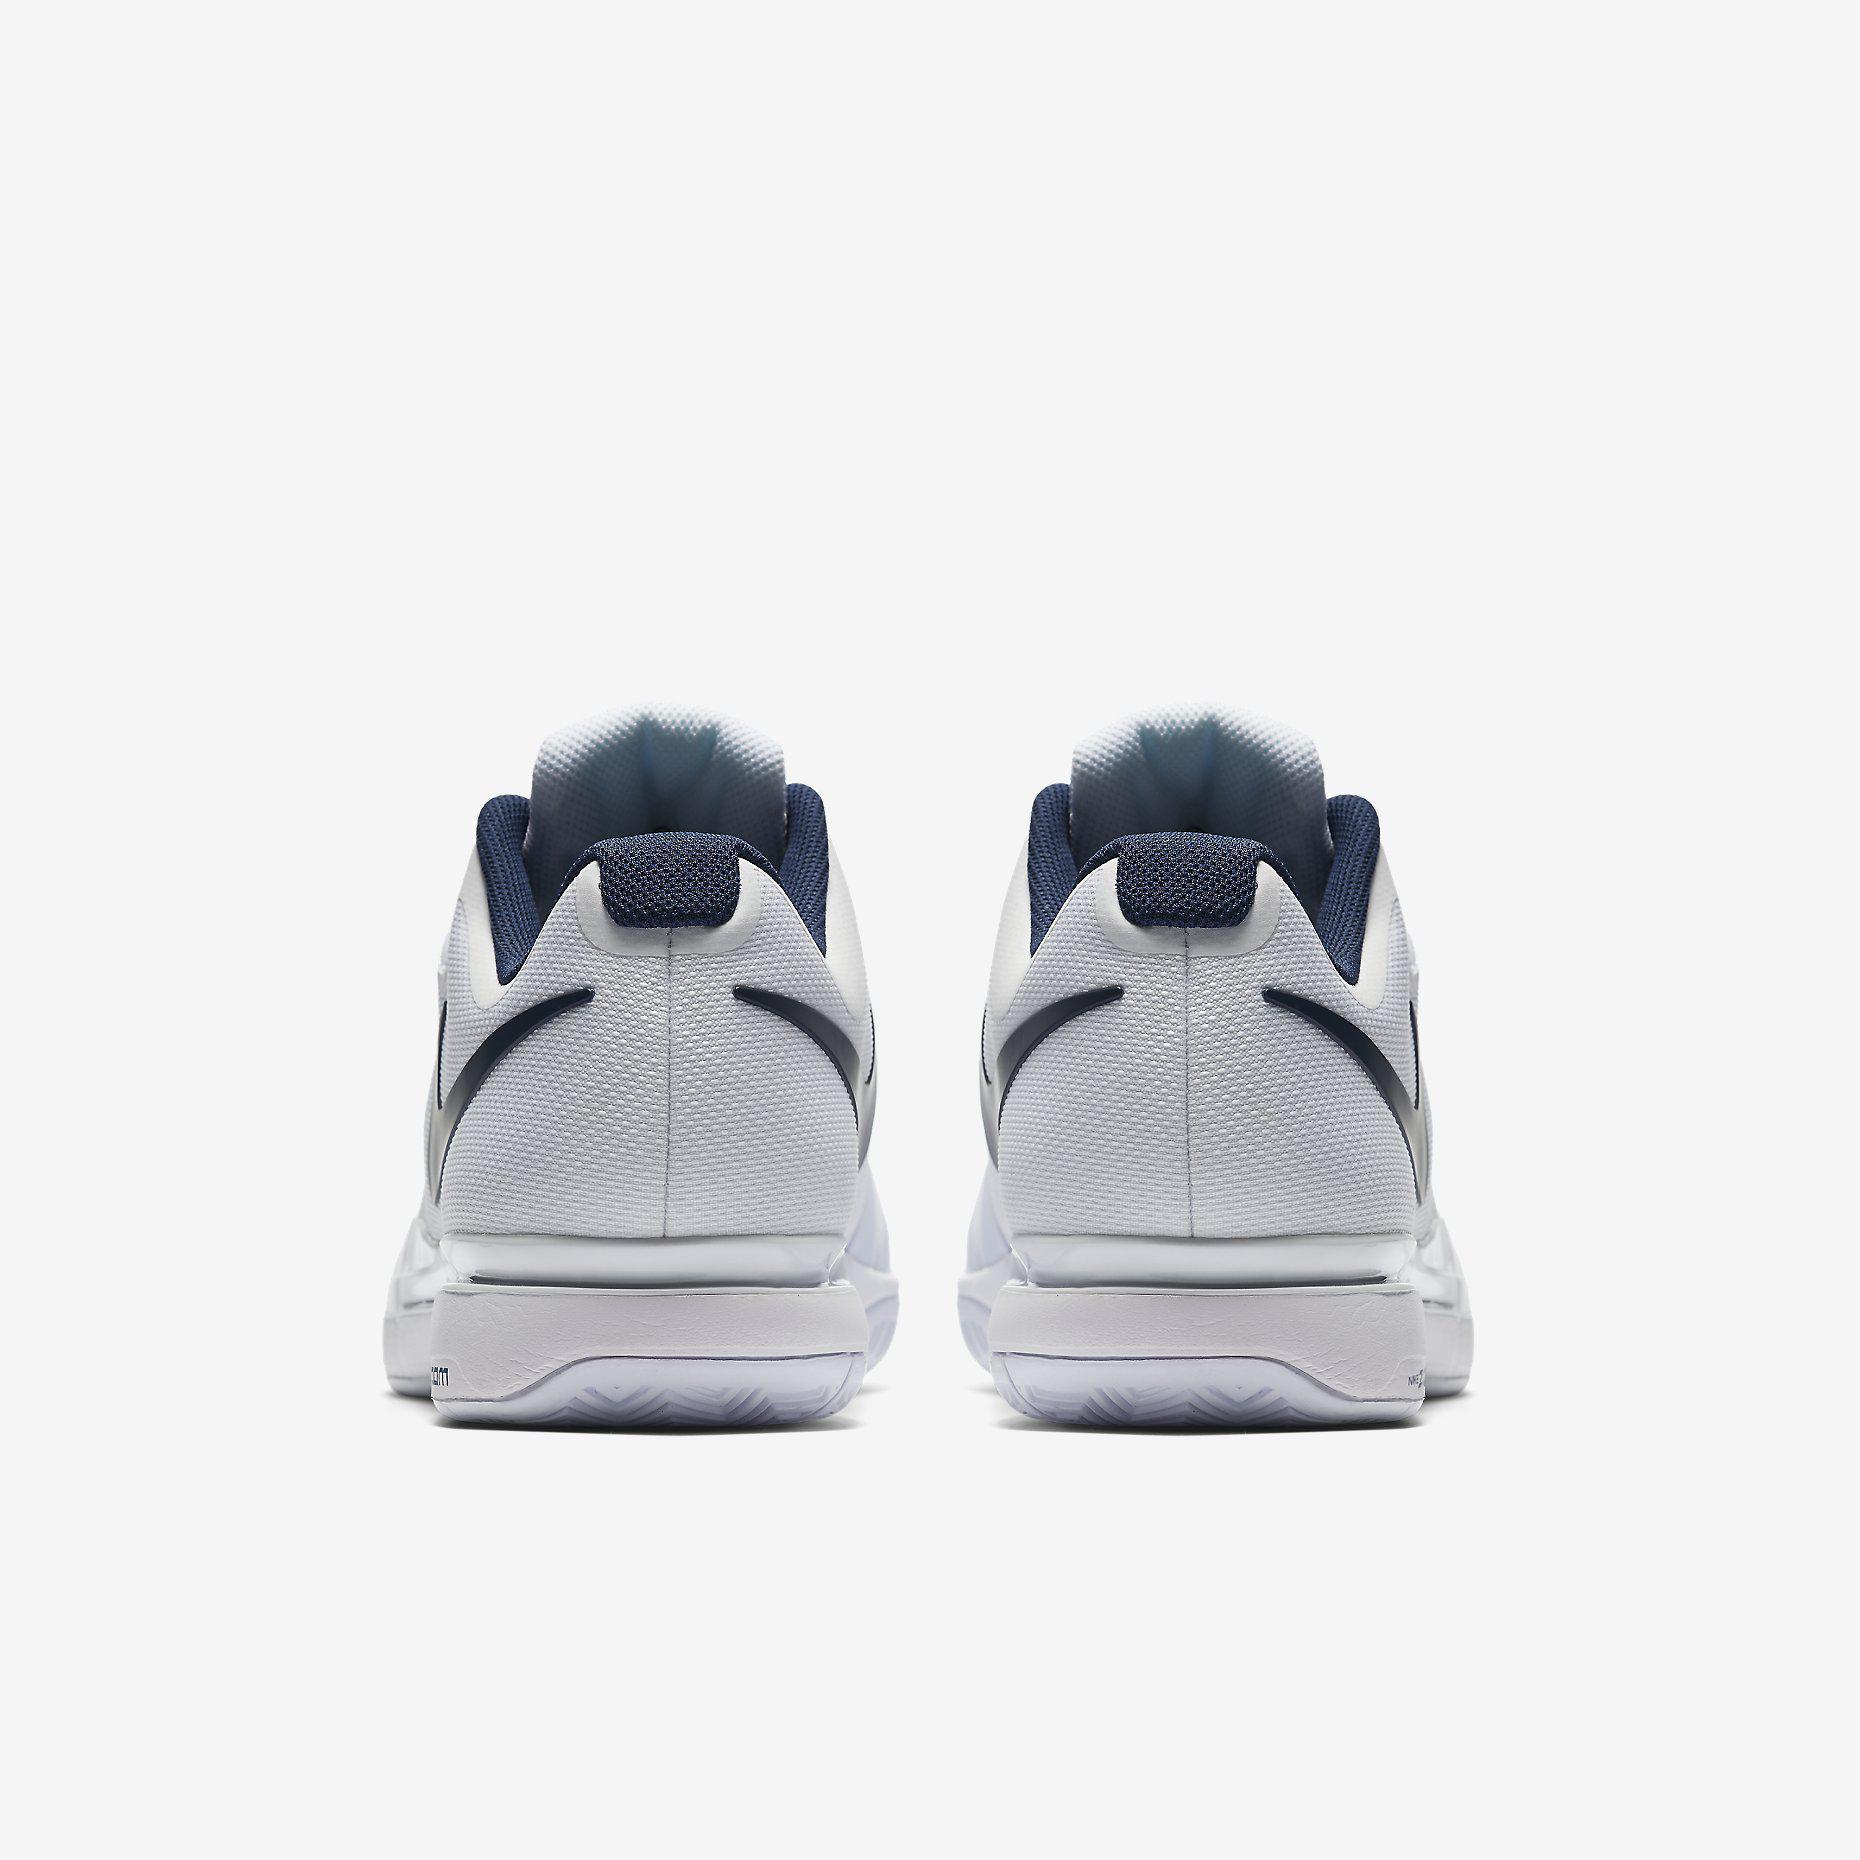 30%. Nike Mens Zoom Vapor 9.5 Tour Tennis Shoes - White/Binary Blue ...